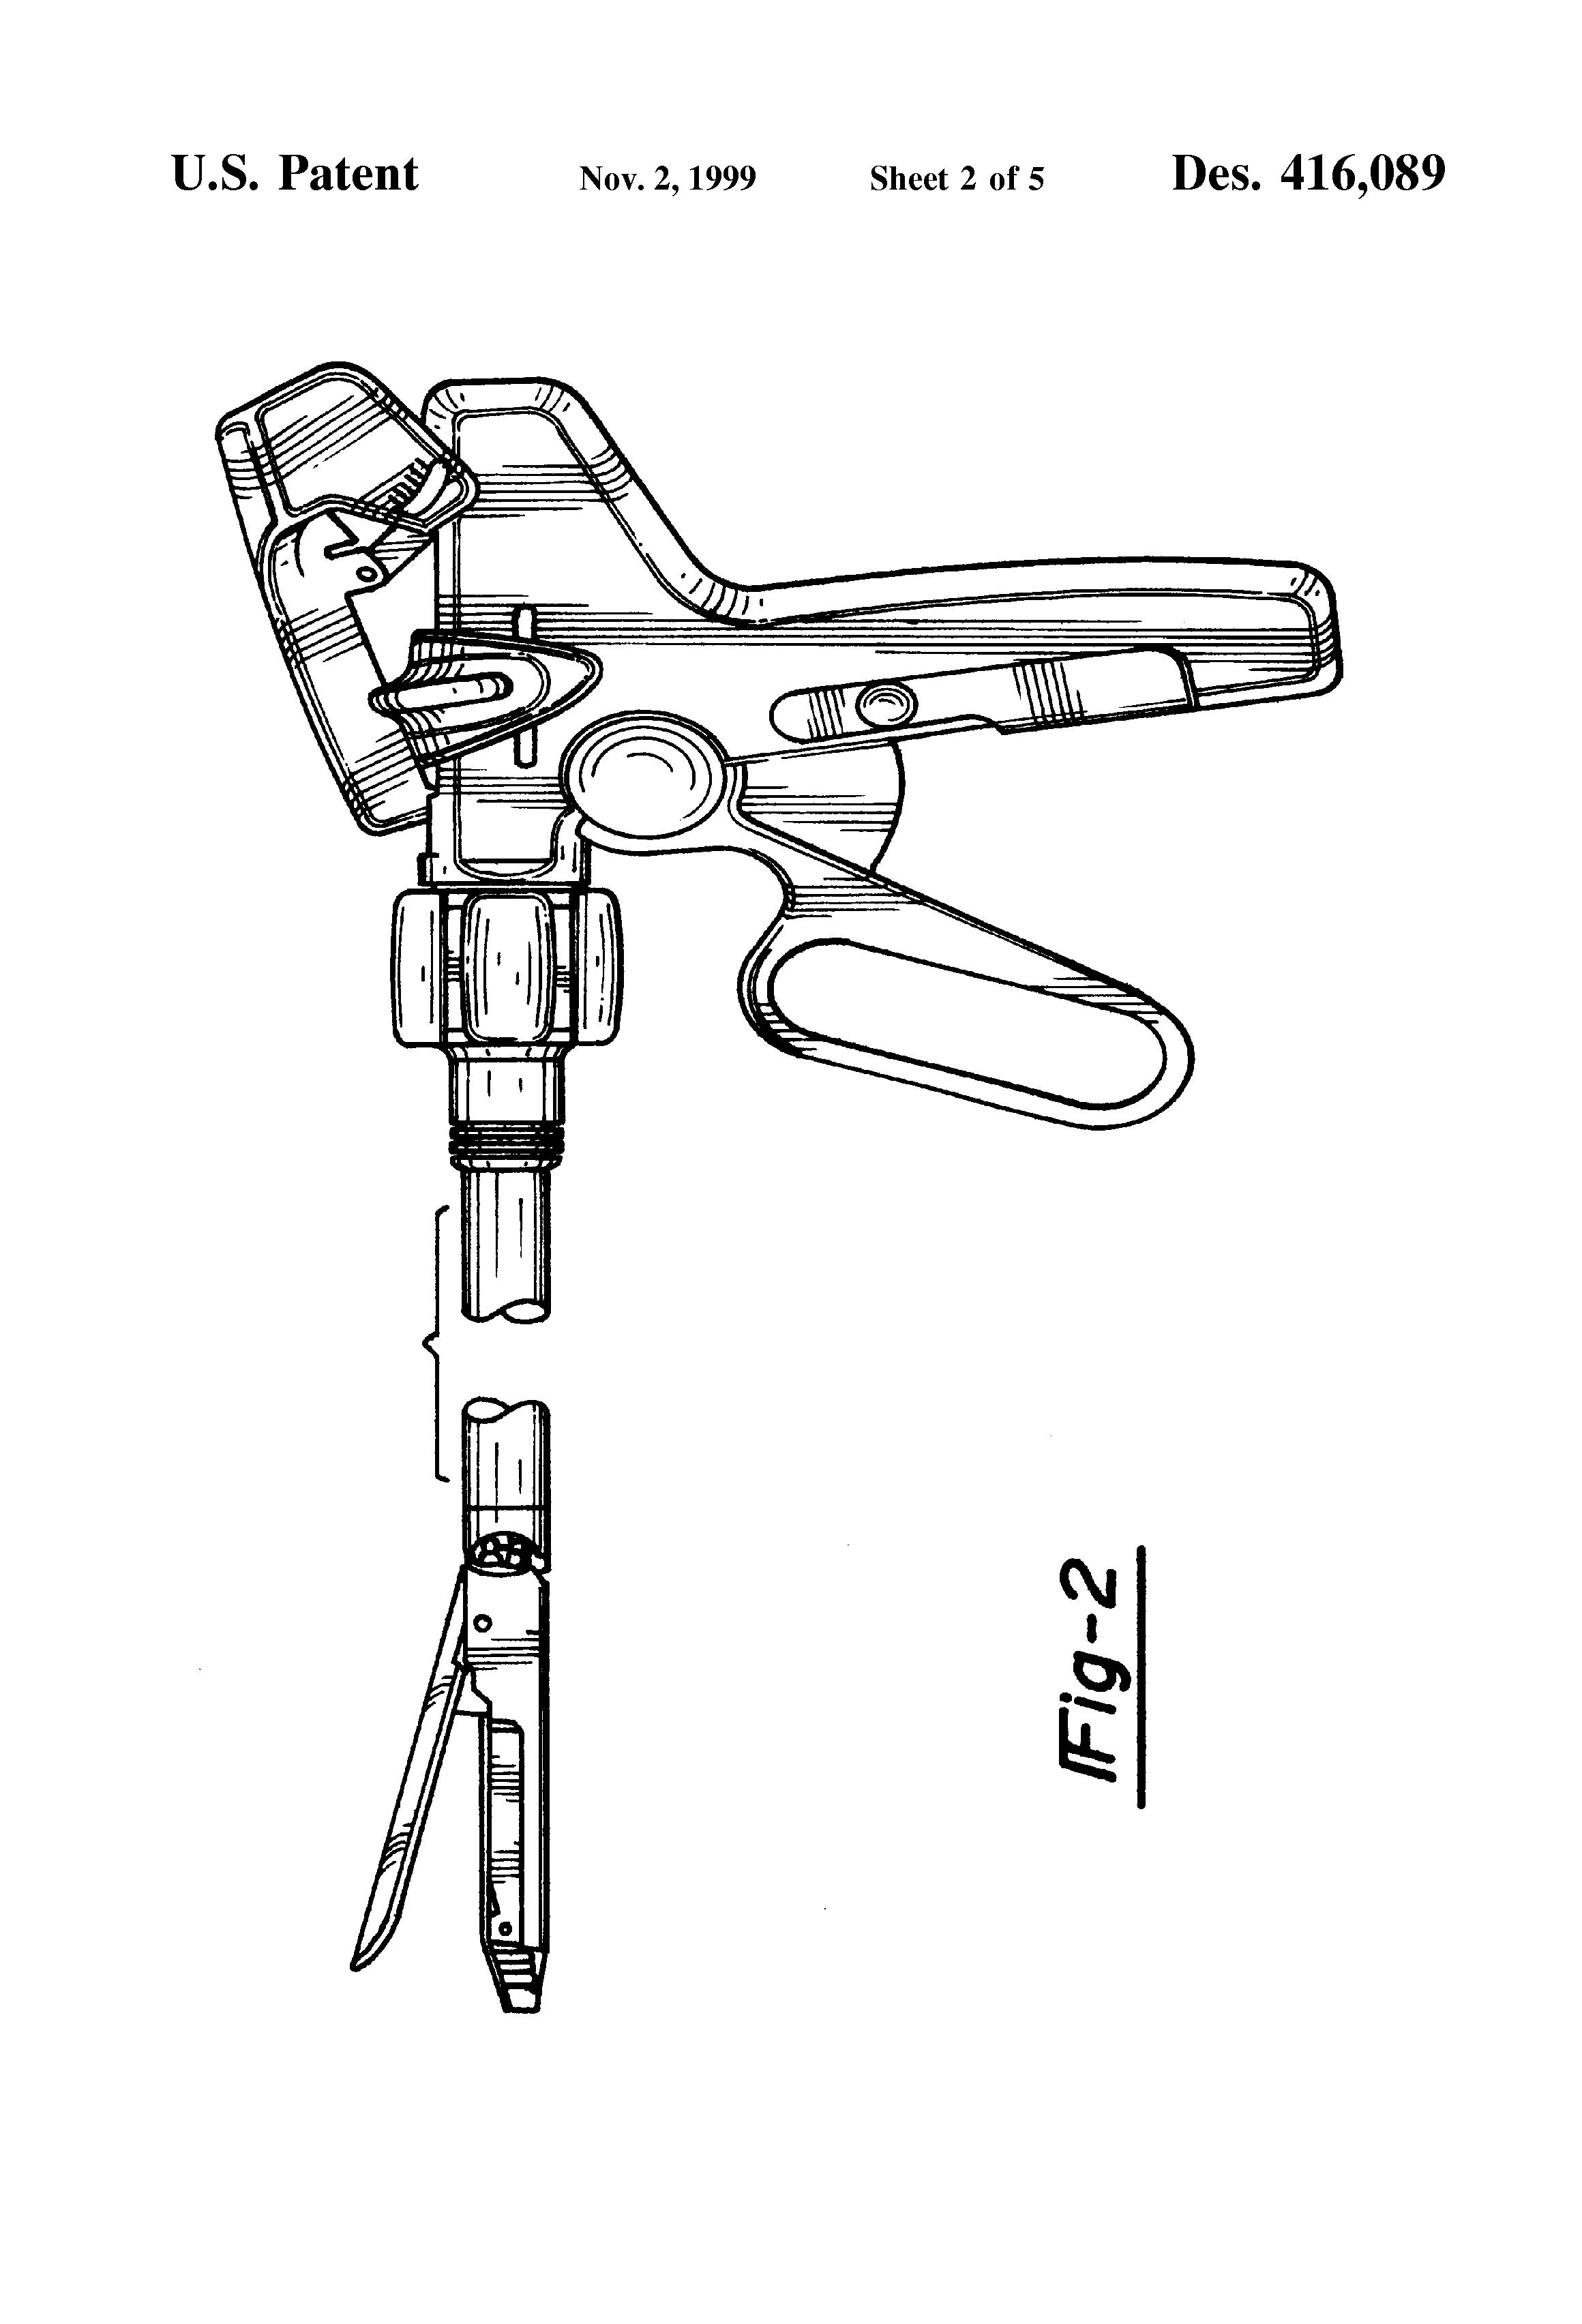 Endoscope Design: Endoscopic Linear Stapling And Dividing